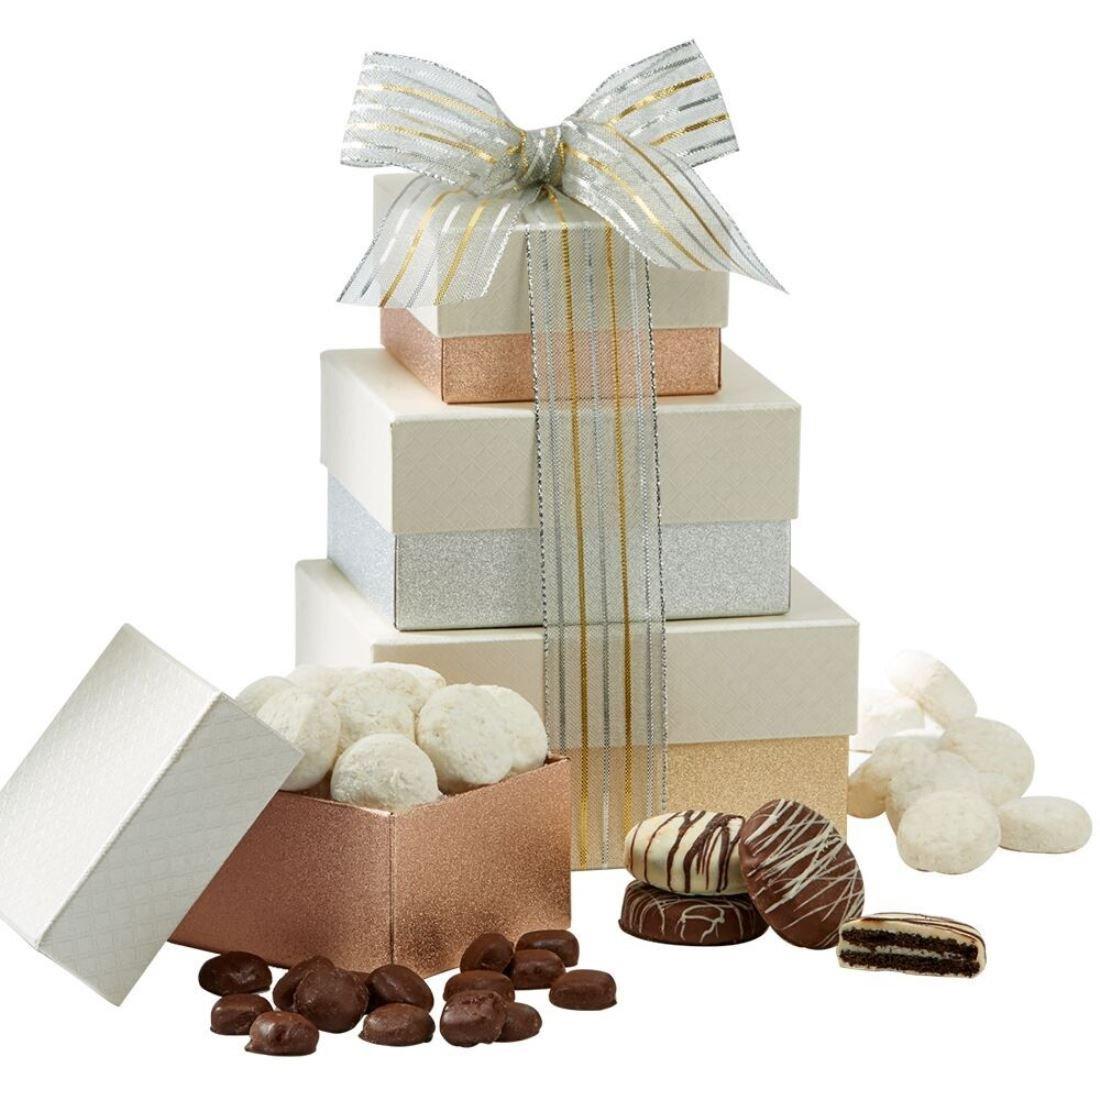 Amazon.com : Hebert Candies WHITE CHOCOLATE LOVERS TOWER : Grocery ...